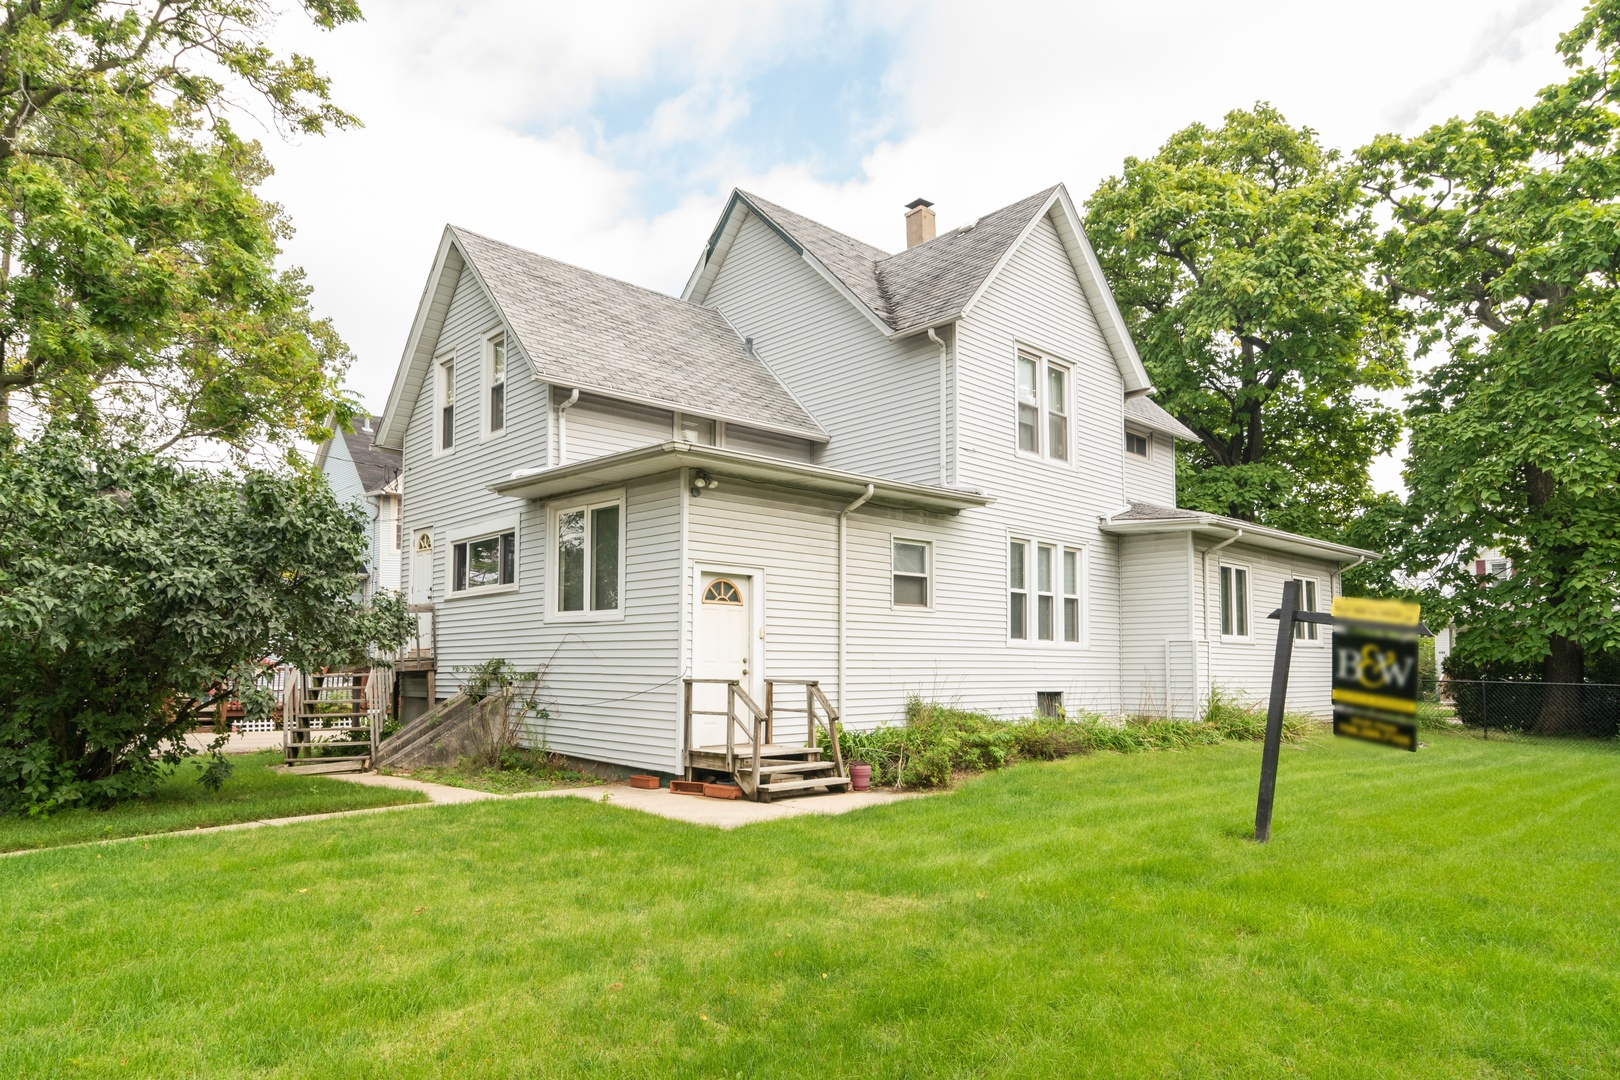 316 South 3rd, Maywood, Illinois, 60153